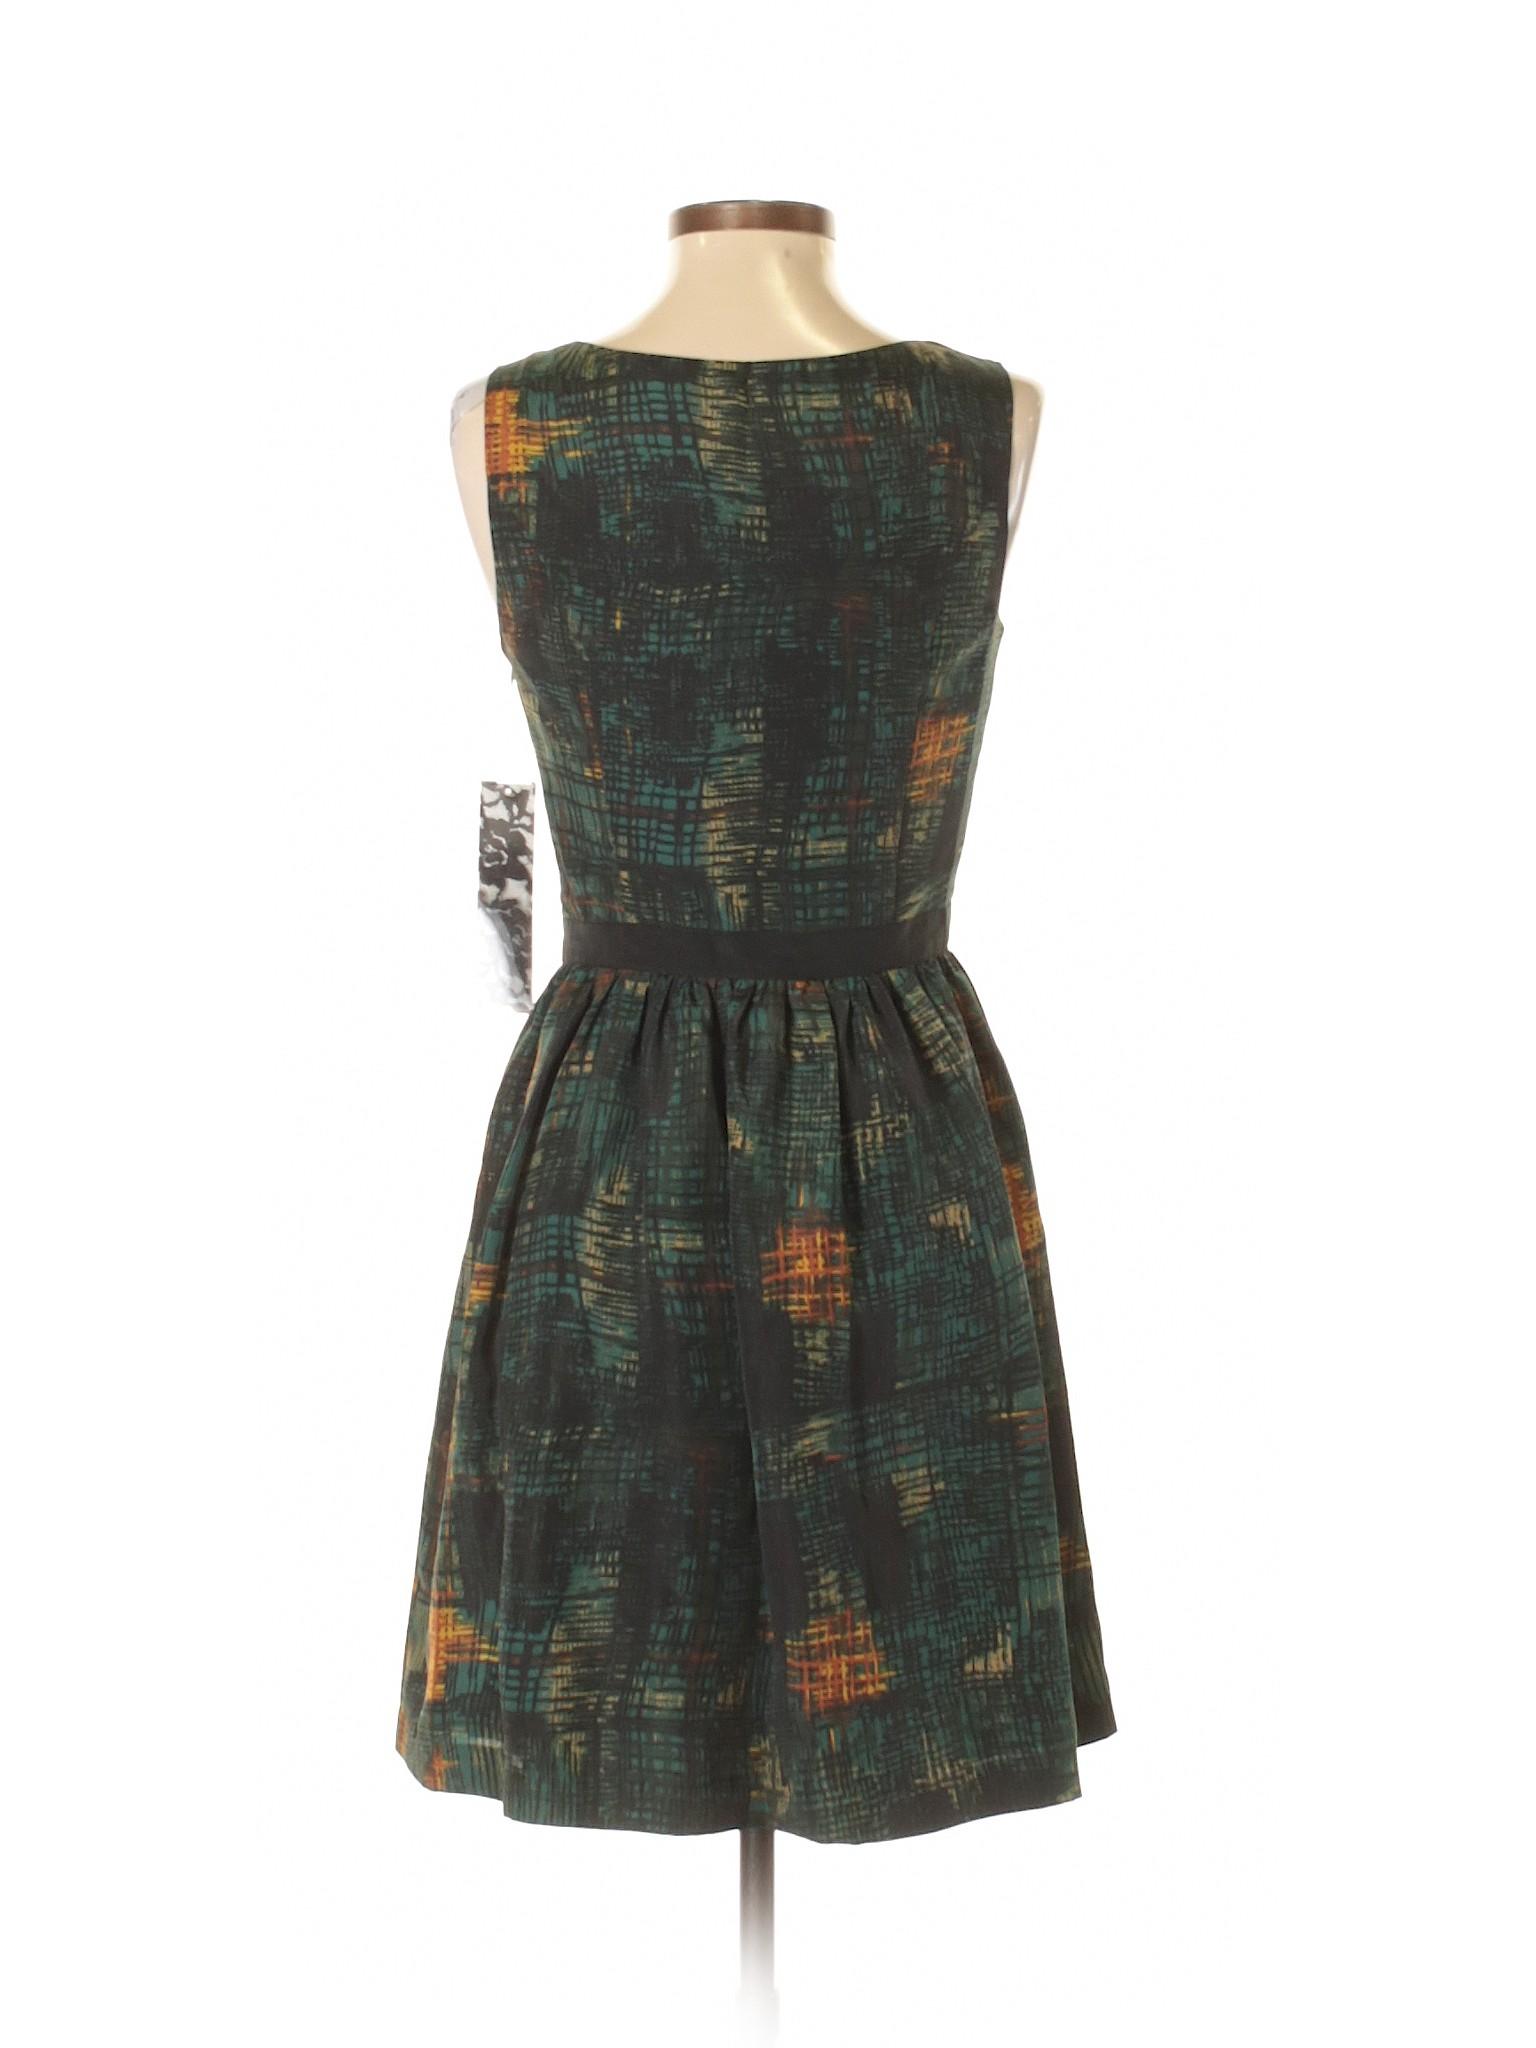 Kensie Kensie Boutique Boutique Casual Kensie Boutique Casual winter Casual winter winter Dress Dress RpCvwxdwq